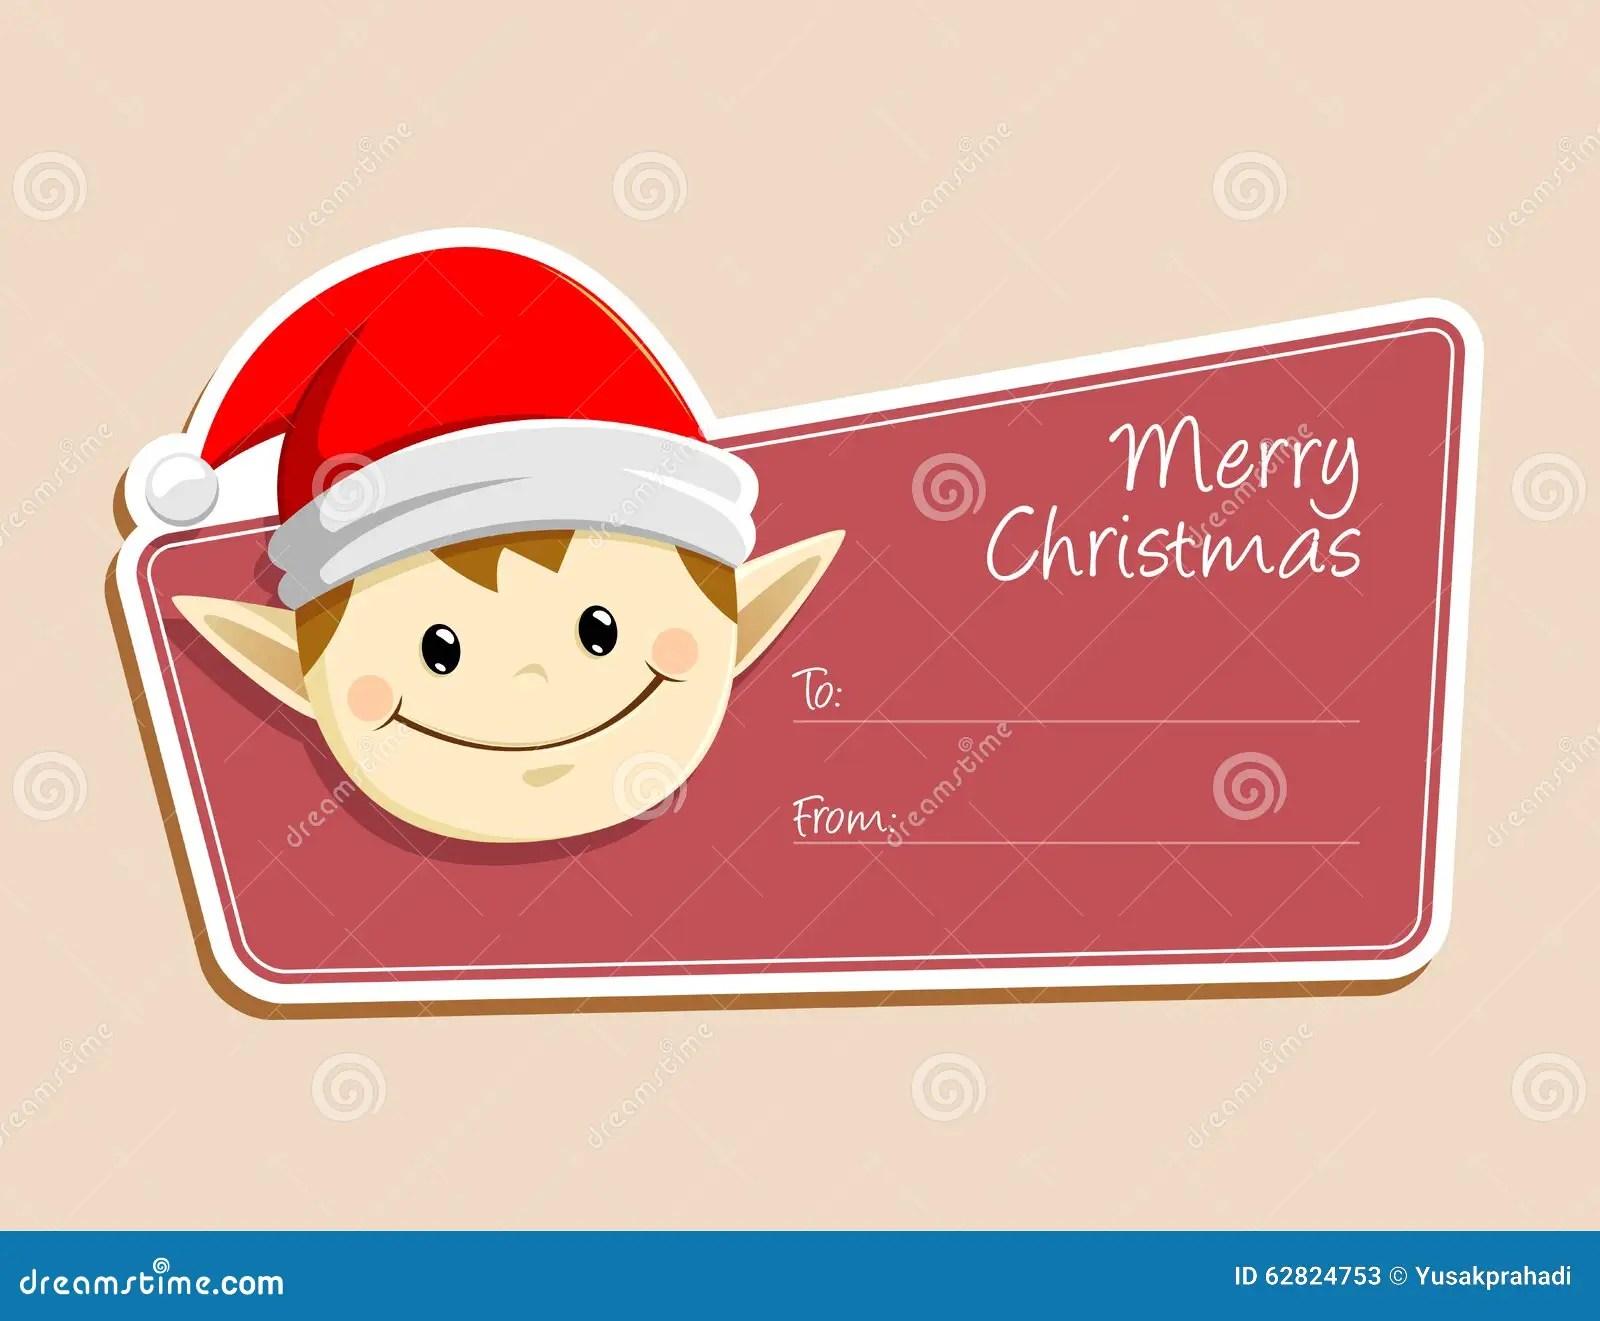 Cartoon Christmas Elf Face Vector Illustration